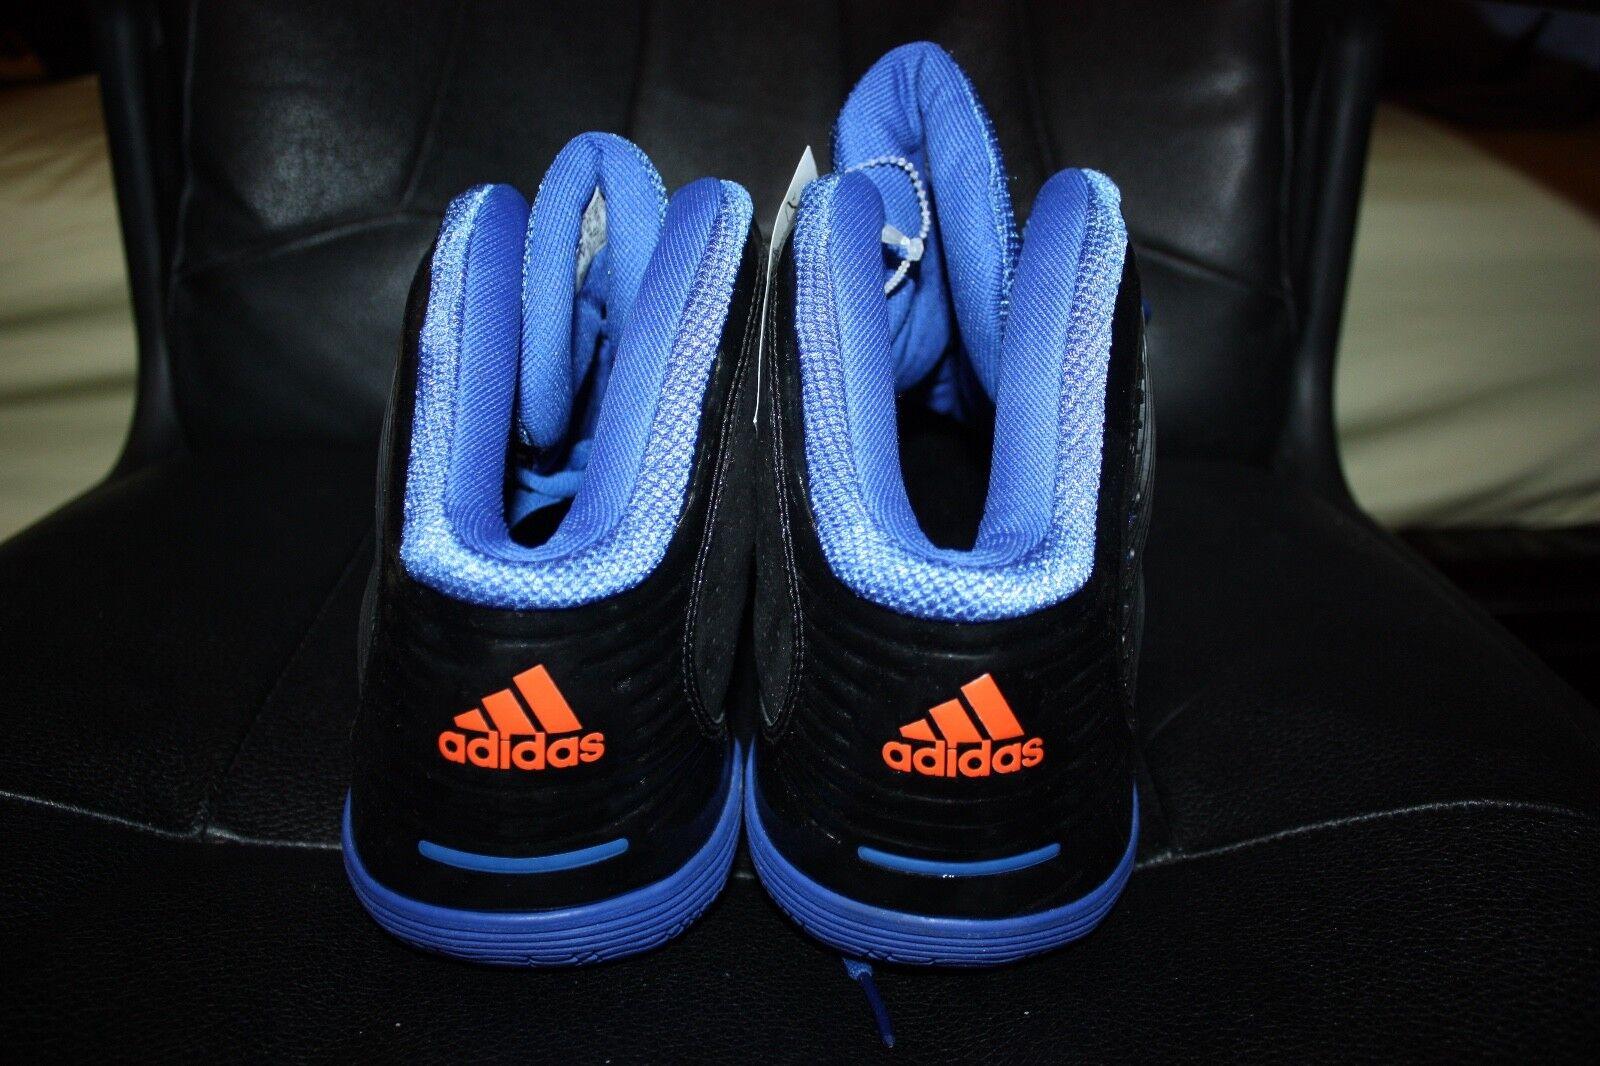 Anthony randolph sz adidas nero blu, new york knicks pe le scarpe